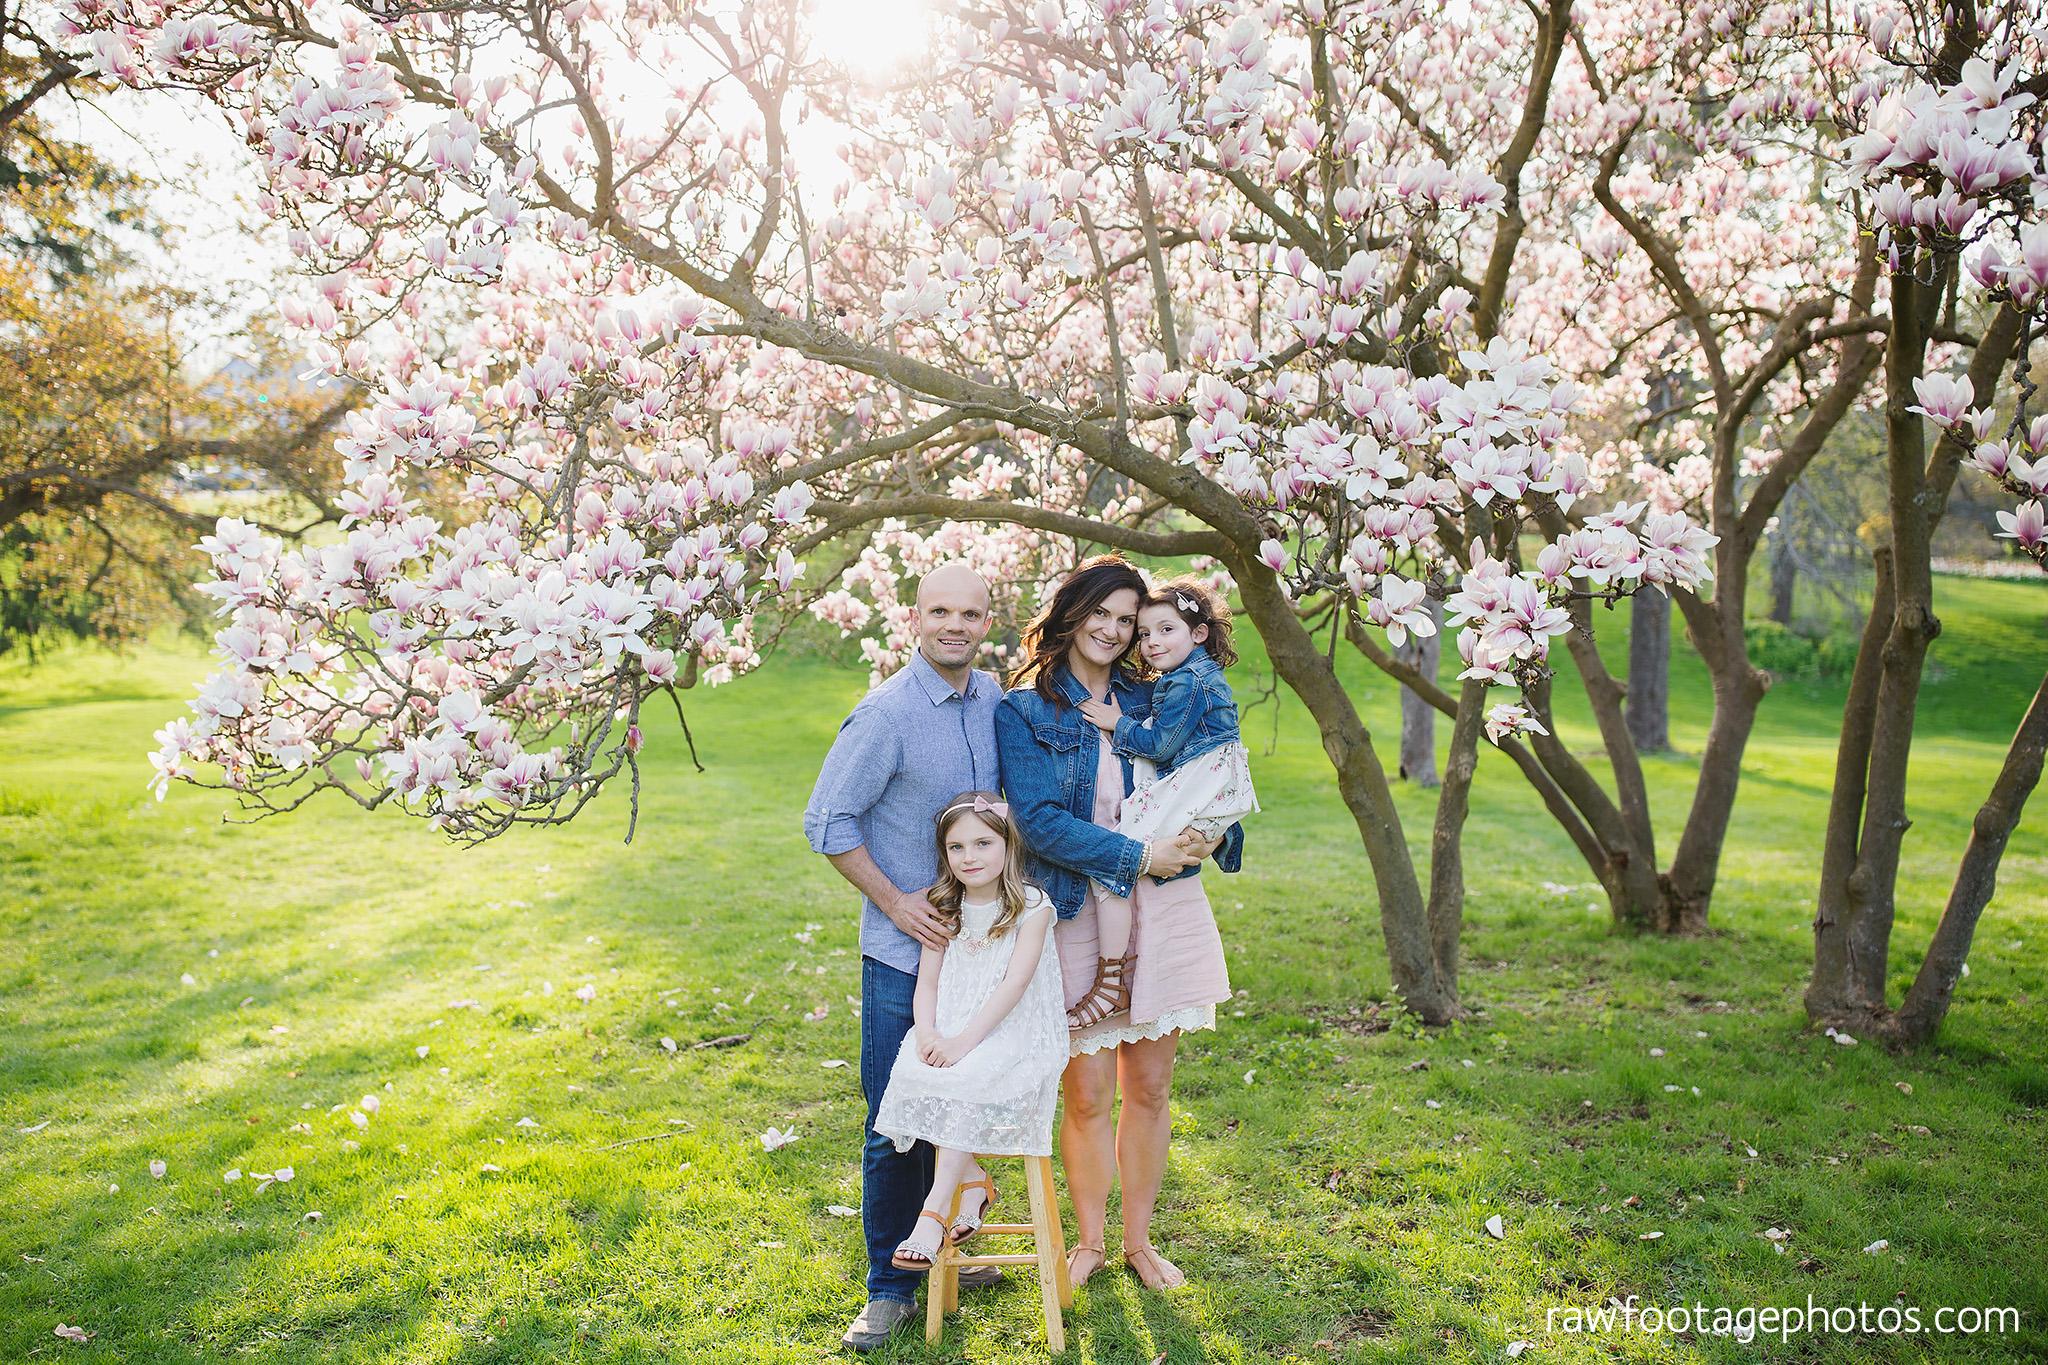 london_ontario_family_photographer-raw_footage_photography-spring_blossom_mini_sessions-magnolia-springbank_park036.jpg